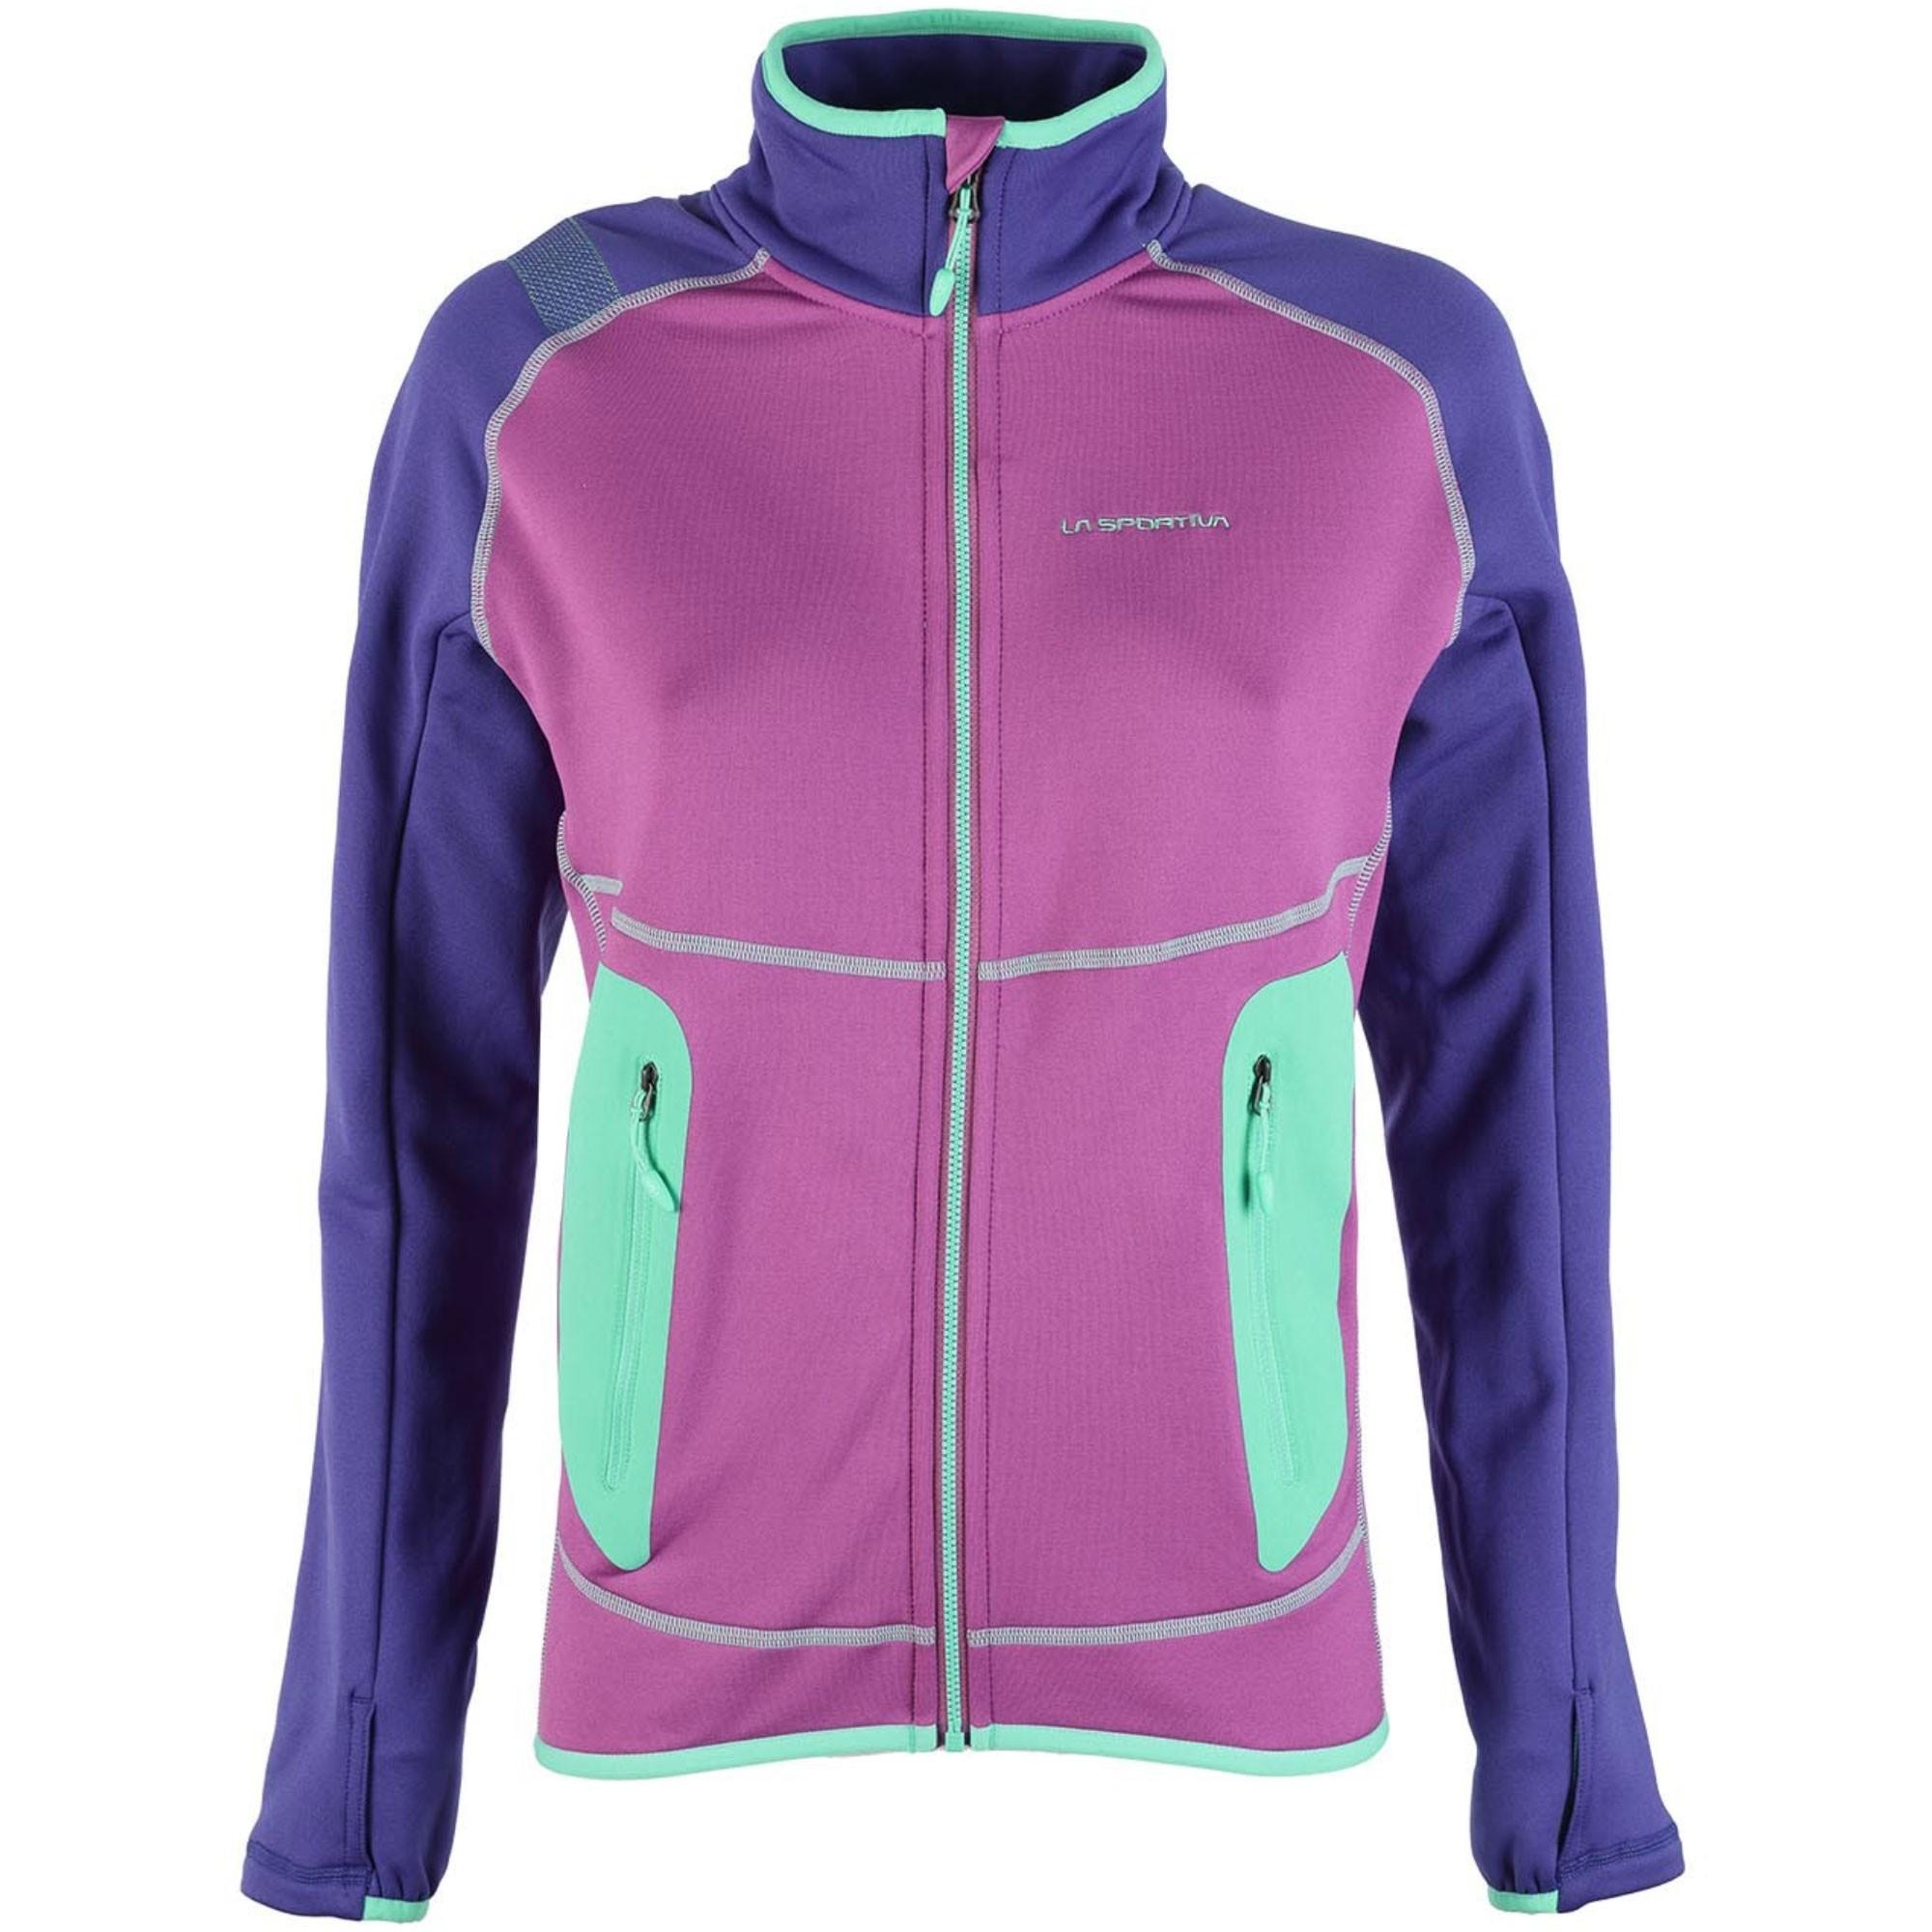 La-Sportiva-Iris-2.0-Jacket-Purple-Iris-W17